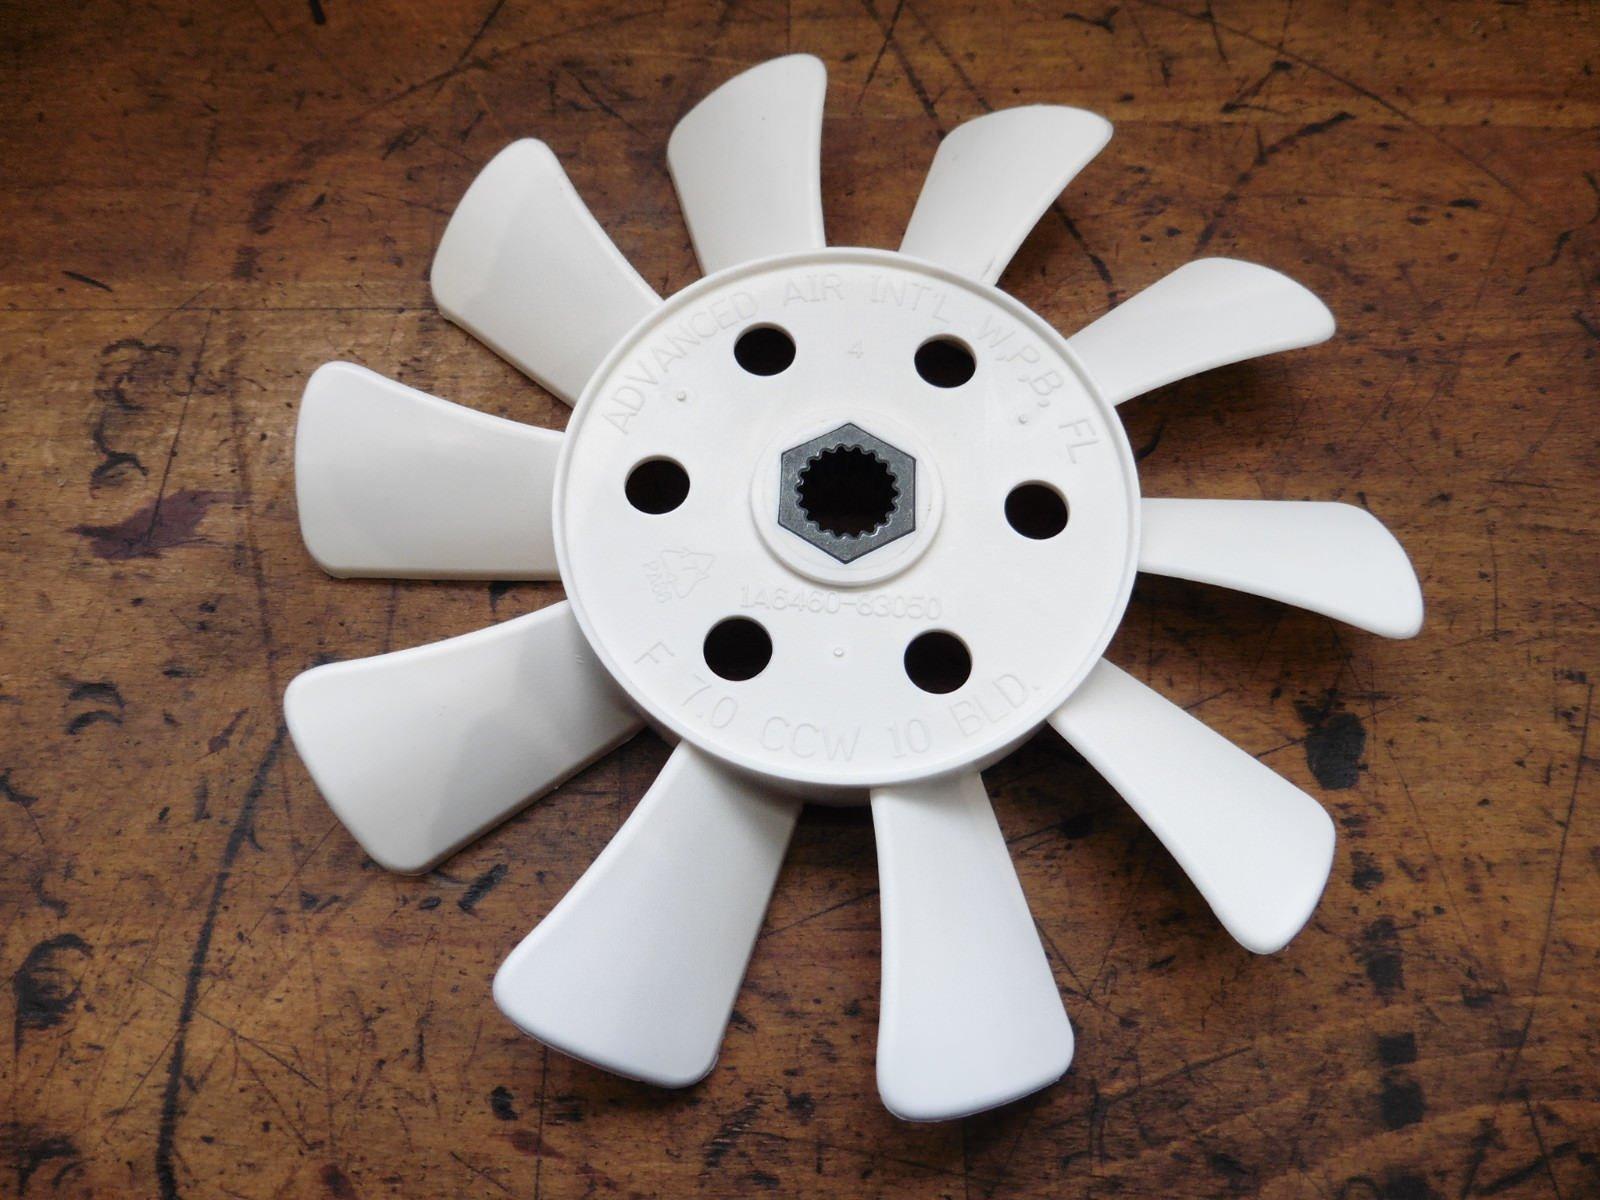 STIGA Lüfterrad für Park Rasentraktor Tuff Torq Getriebe Antrieb Lüfter Gebläse